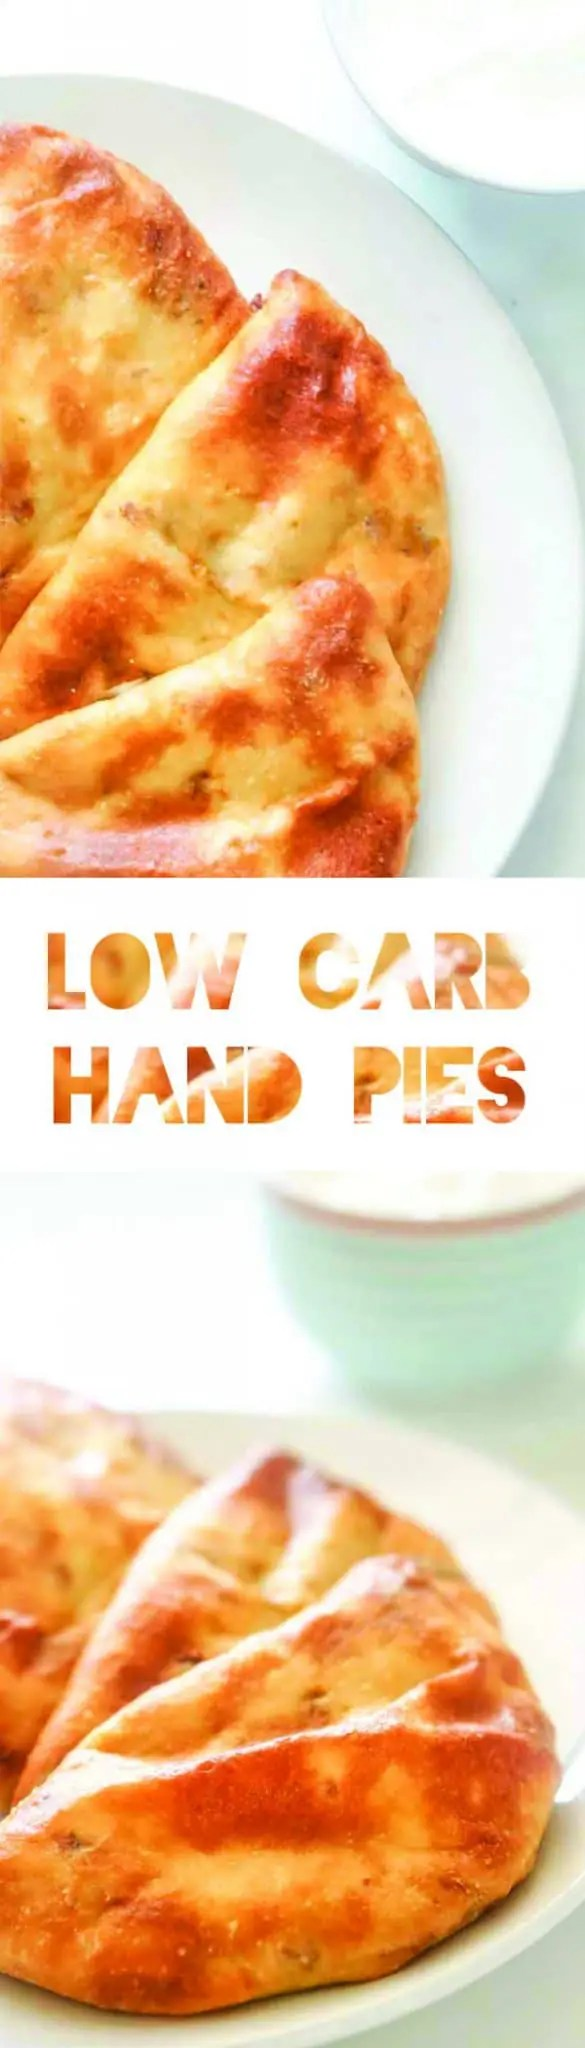 Low Carb Hand Pies Recipes | Keto Recipes | Fathead Pizza | Atkins